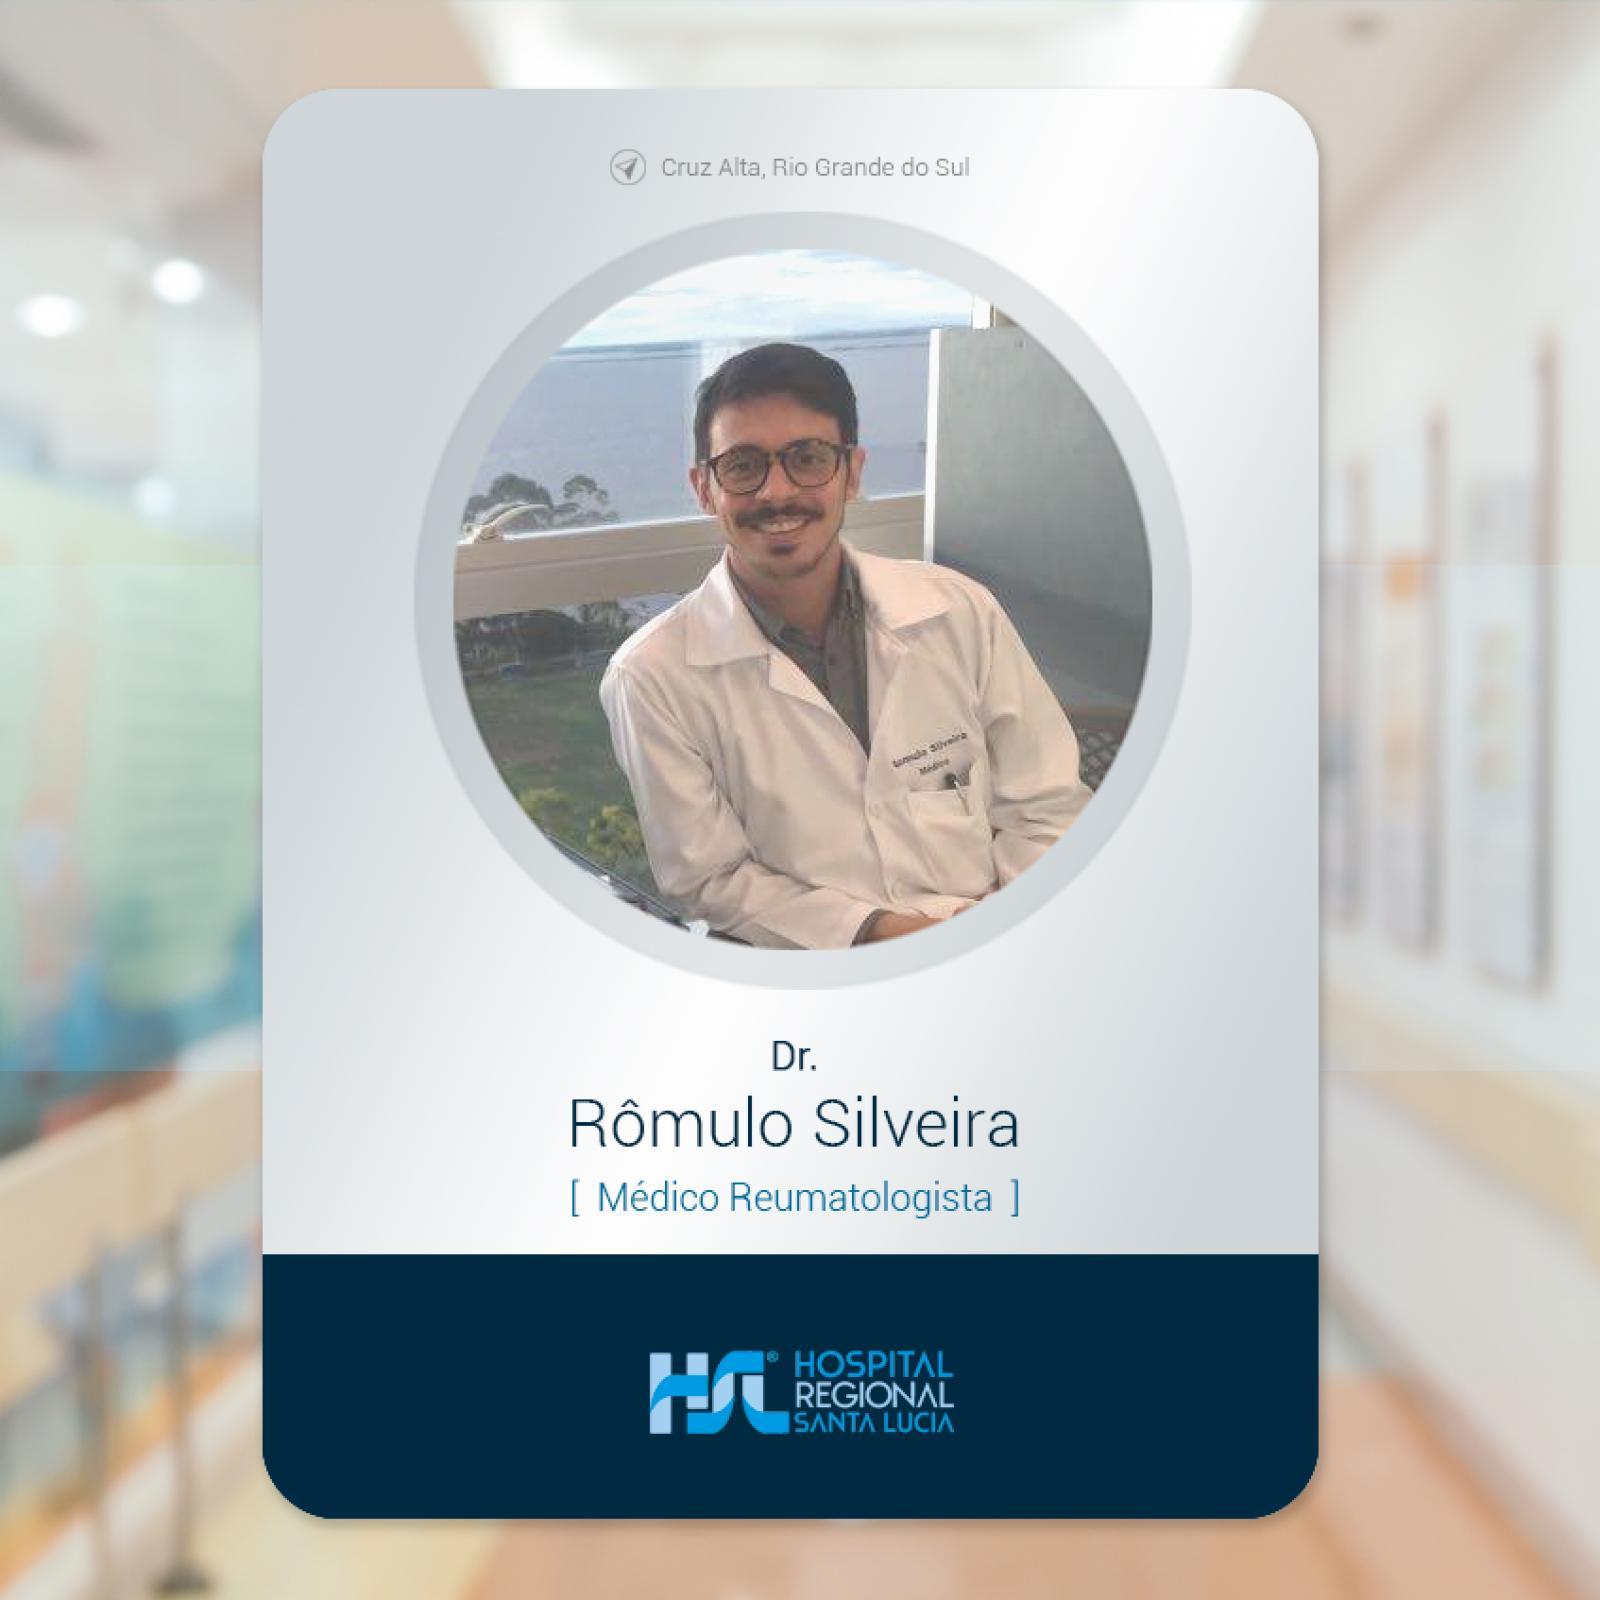 Dr. Rômulo Silveira